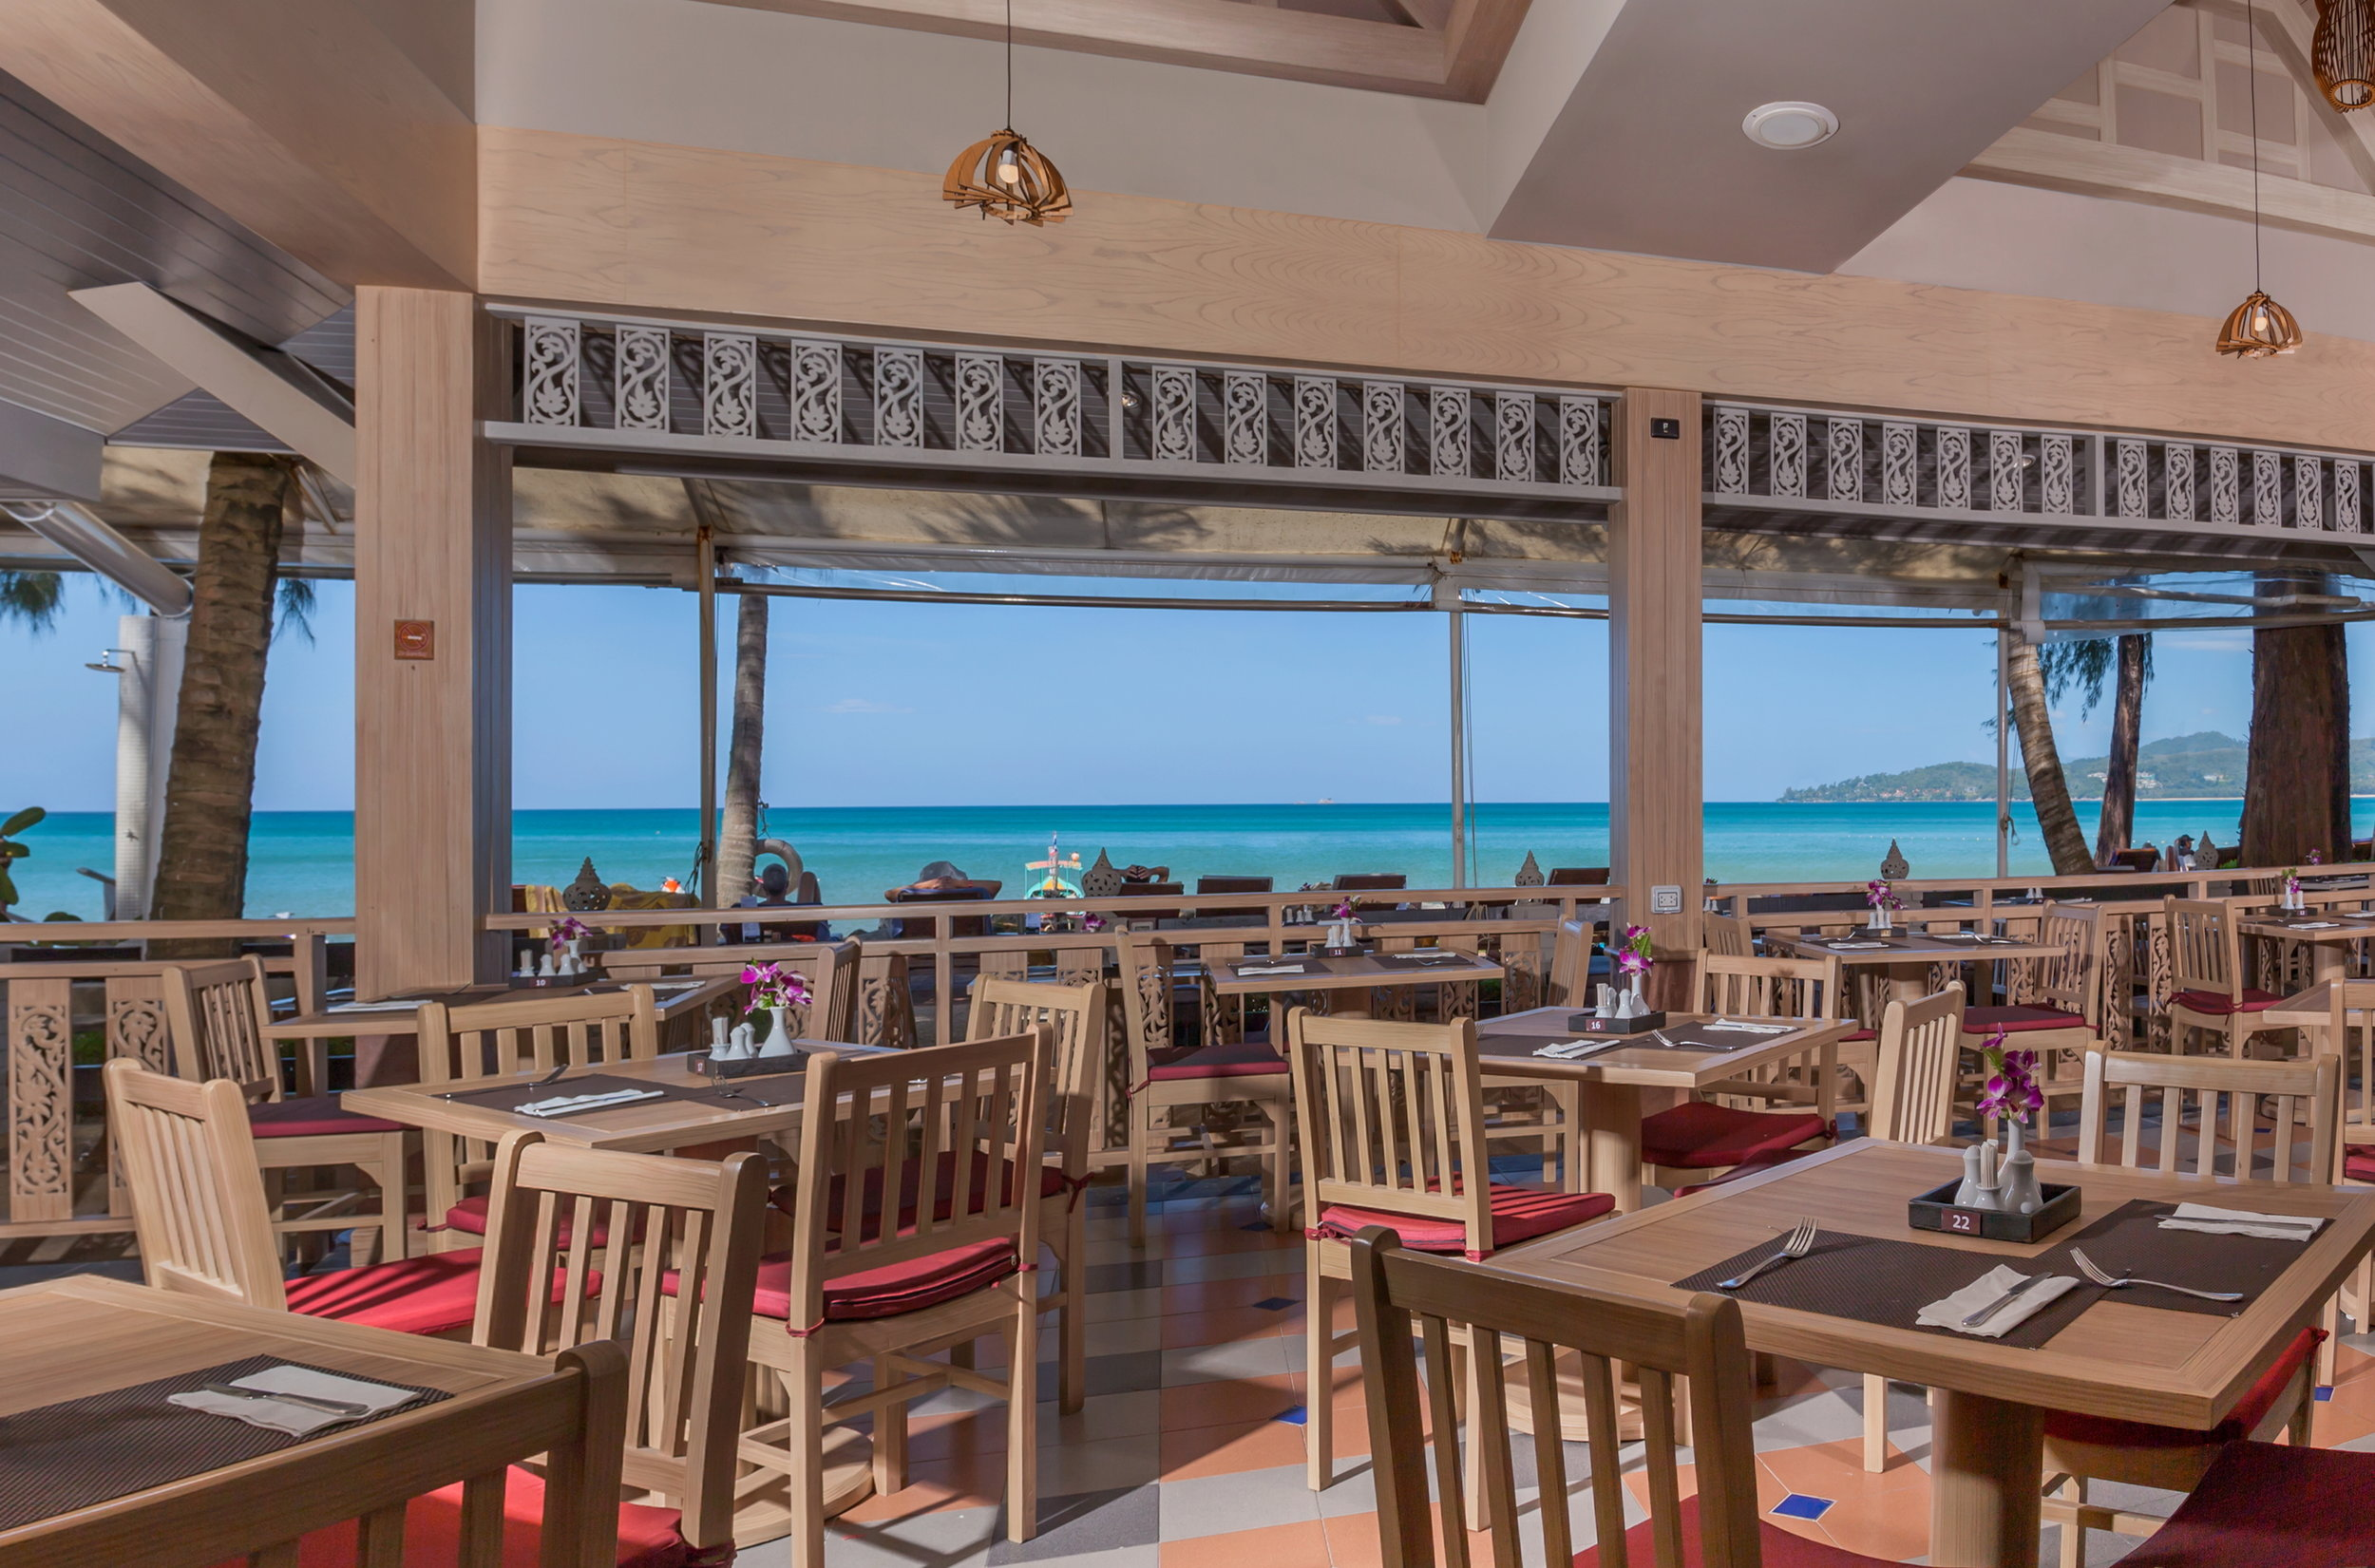 096_The Beach Restaurant_002JPG.jpg